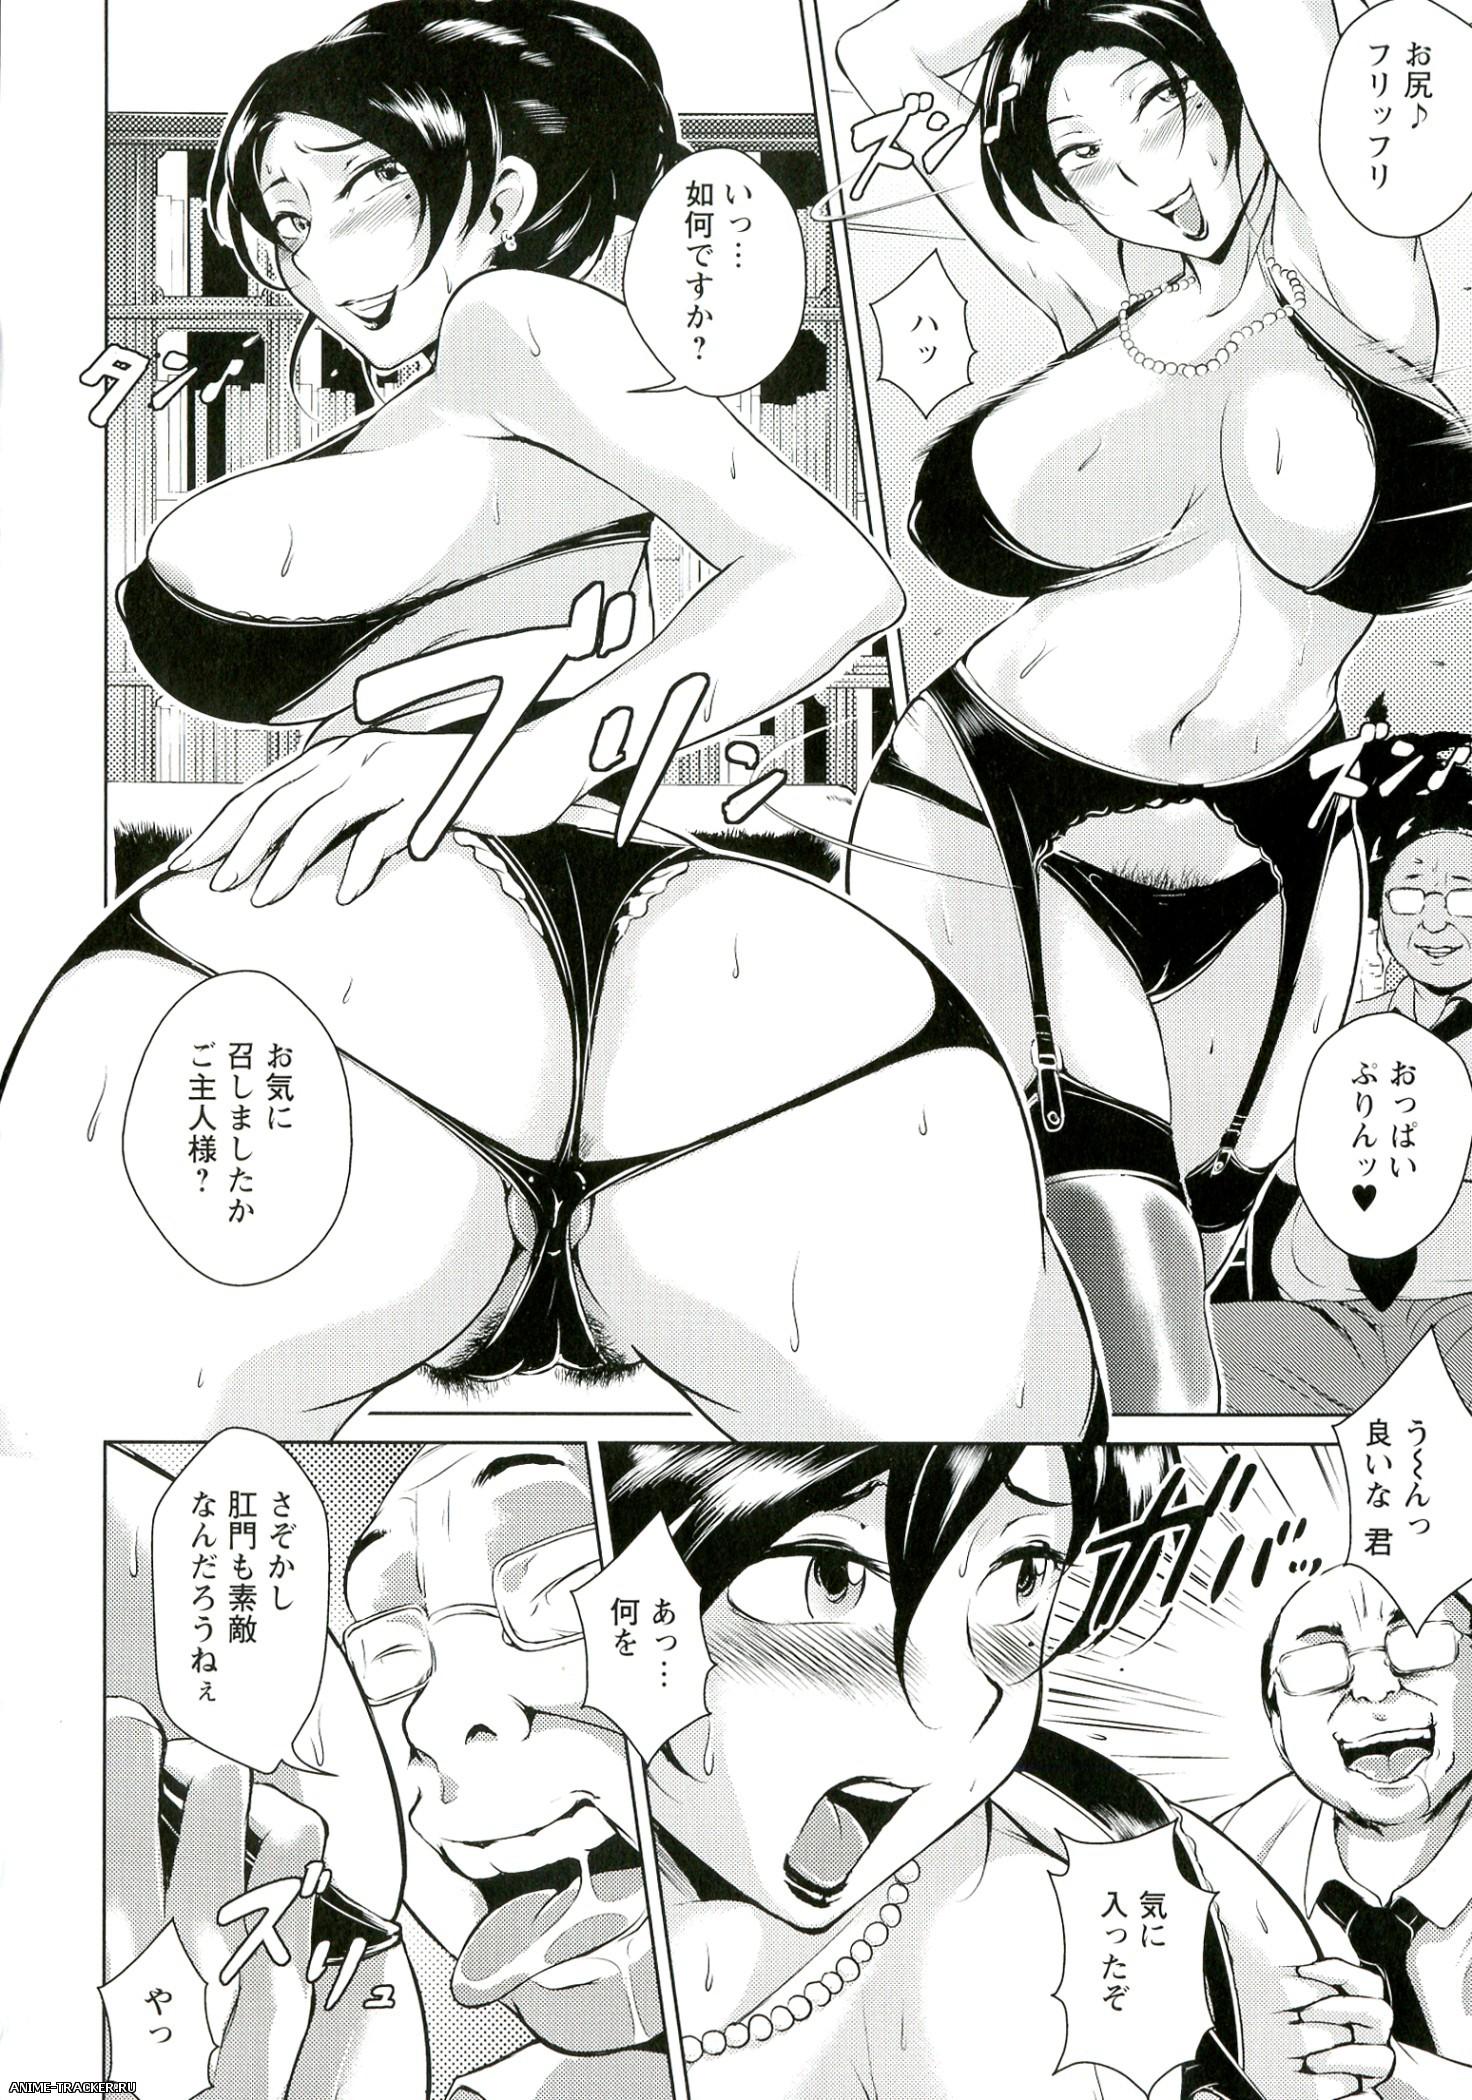 Bitch*Goigostar / Udonko Bitch — Сборник хентай манги [Cen] [JAP,ENG] Manga Hentai